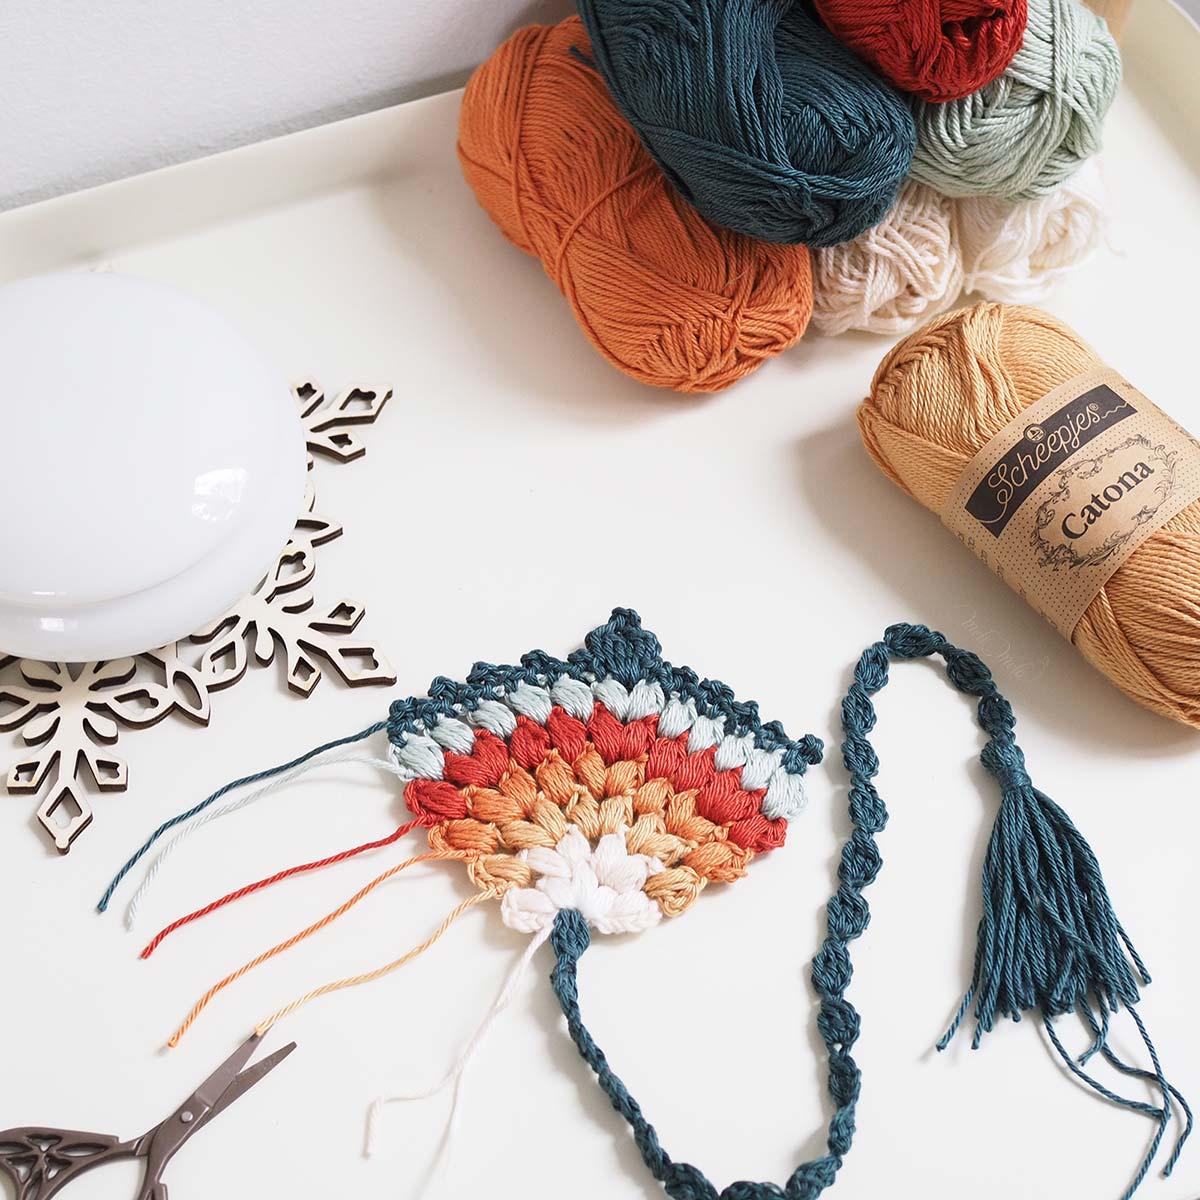 marque-page-crochet-pompon-gland-automne-laboutiquedemelimelo